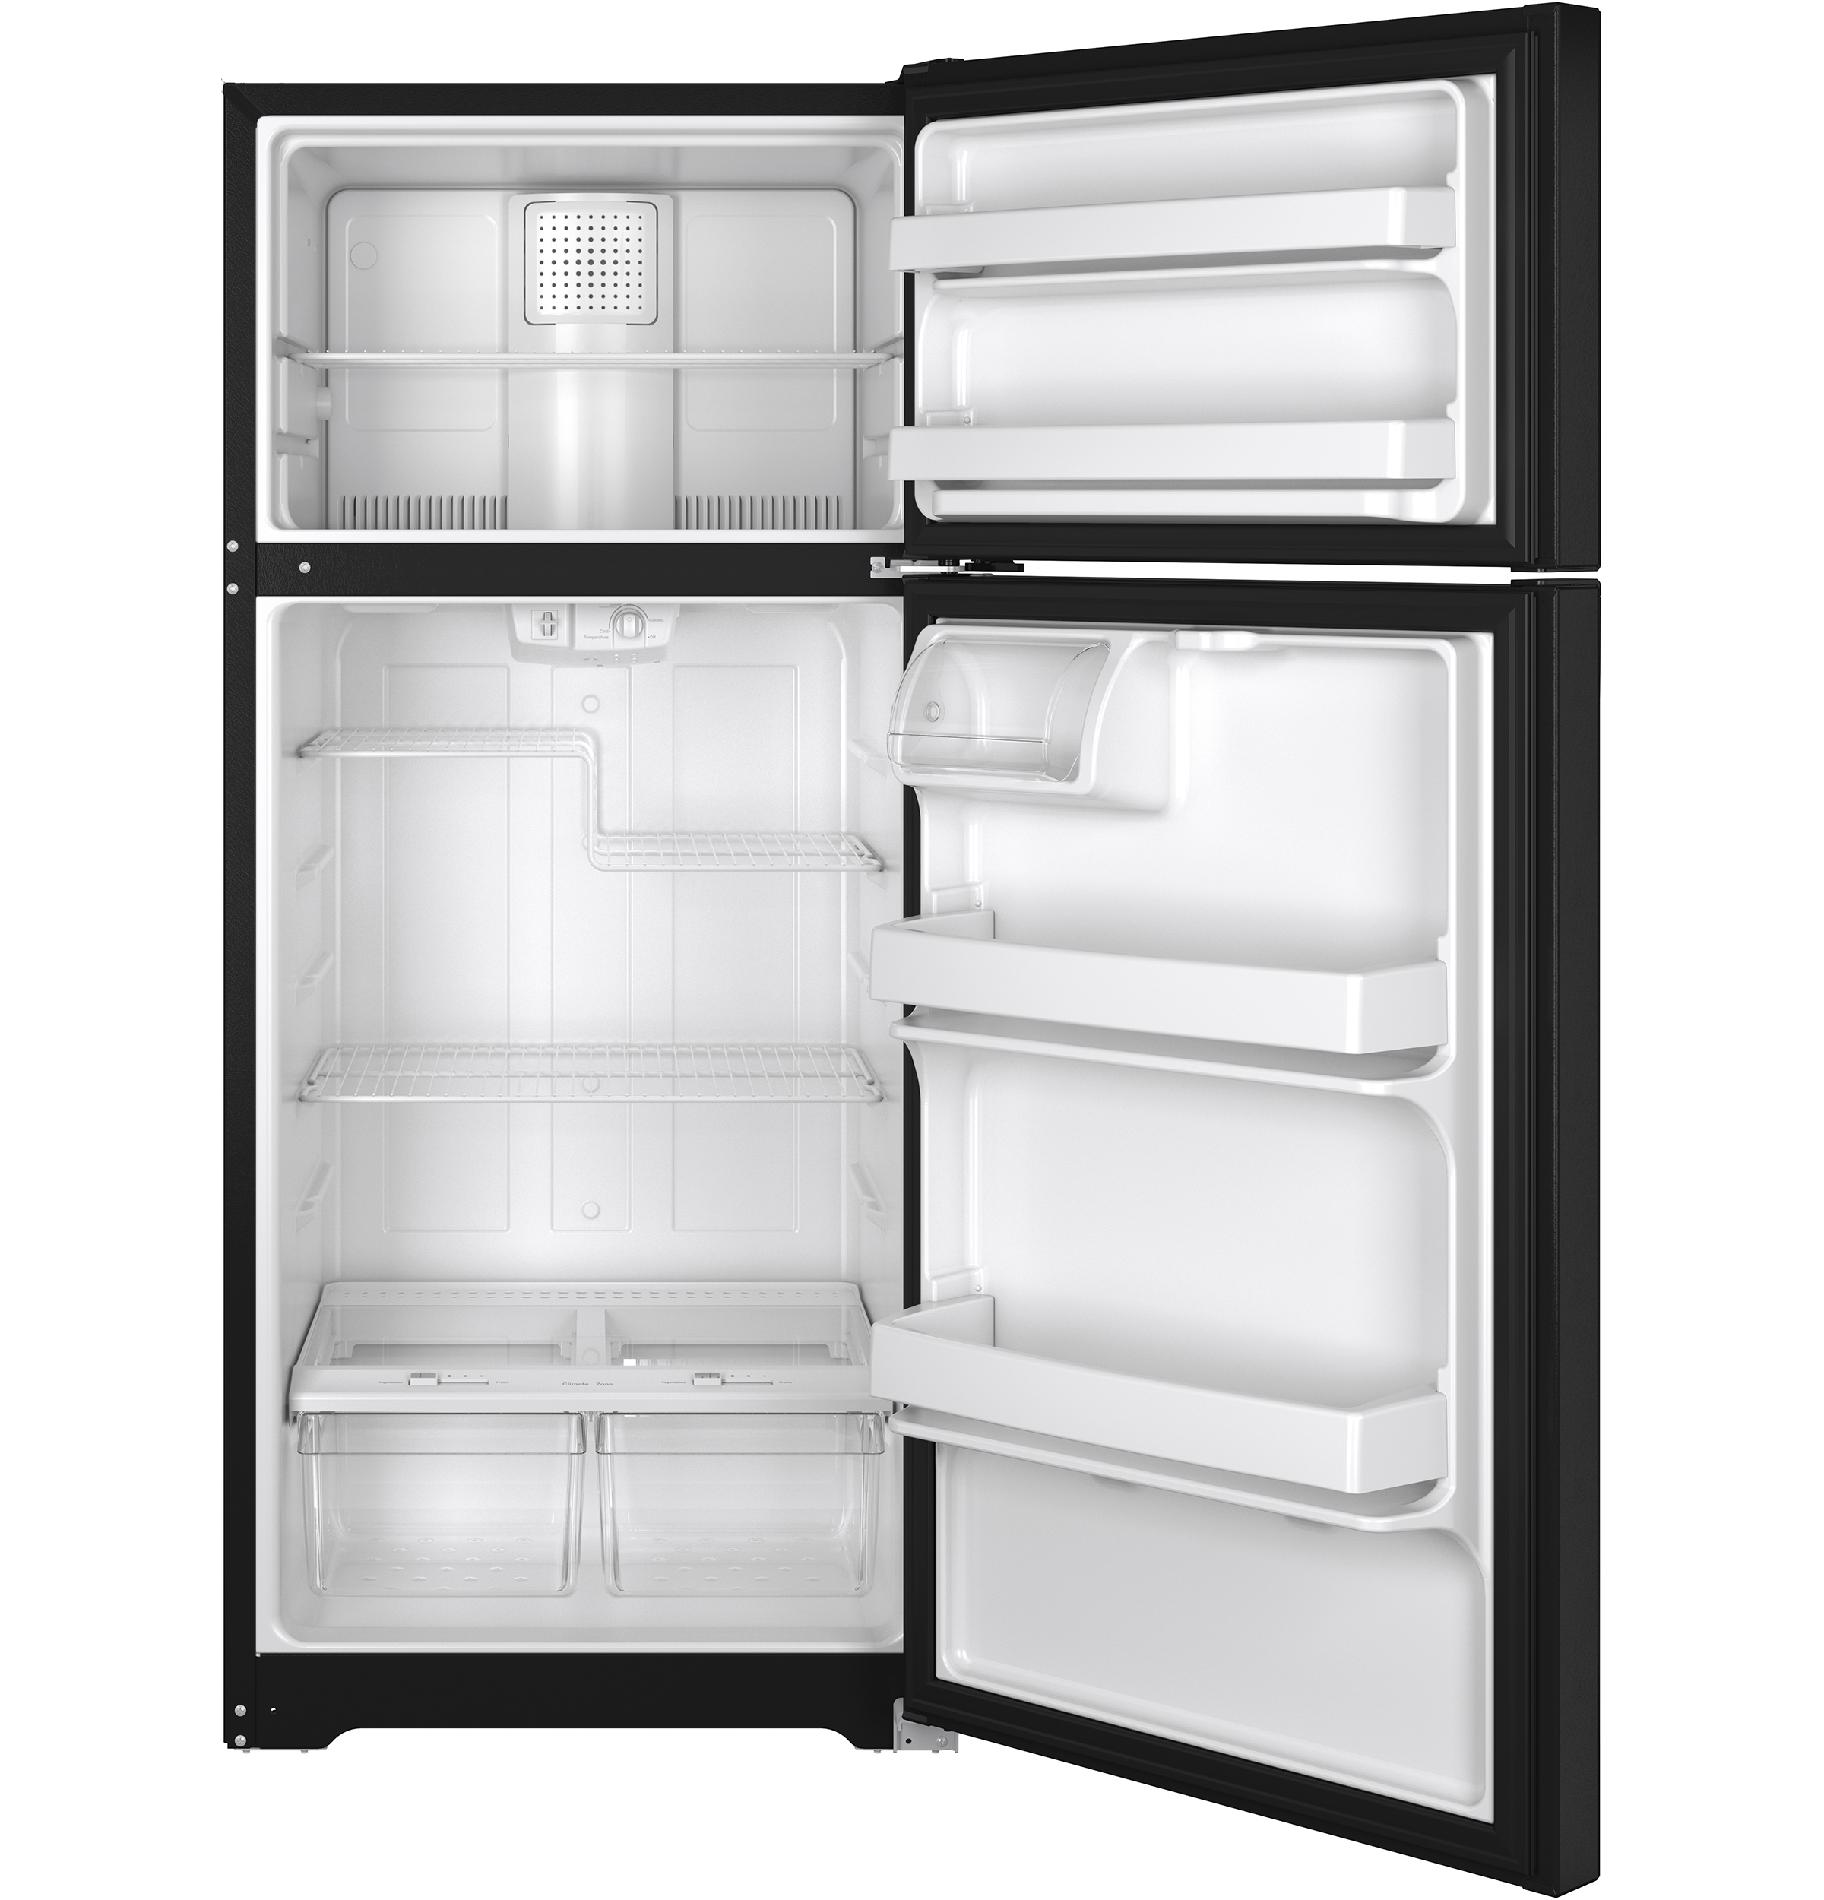 GE Appliances GTE16DTHBB 15.5 cu. ft. Top-Freezer Refrigerator - Black